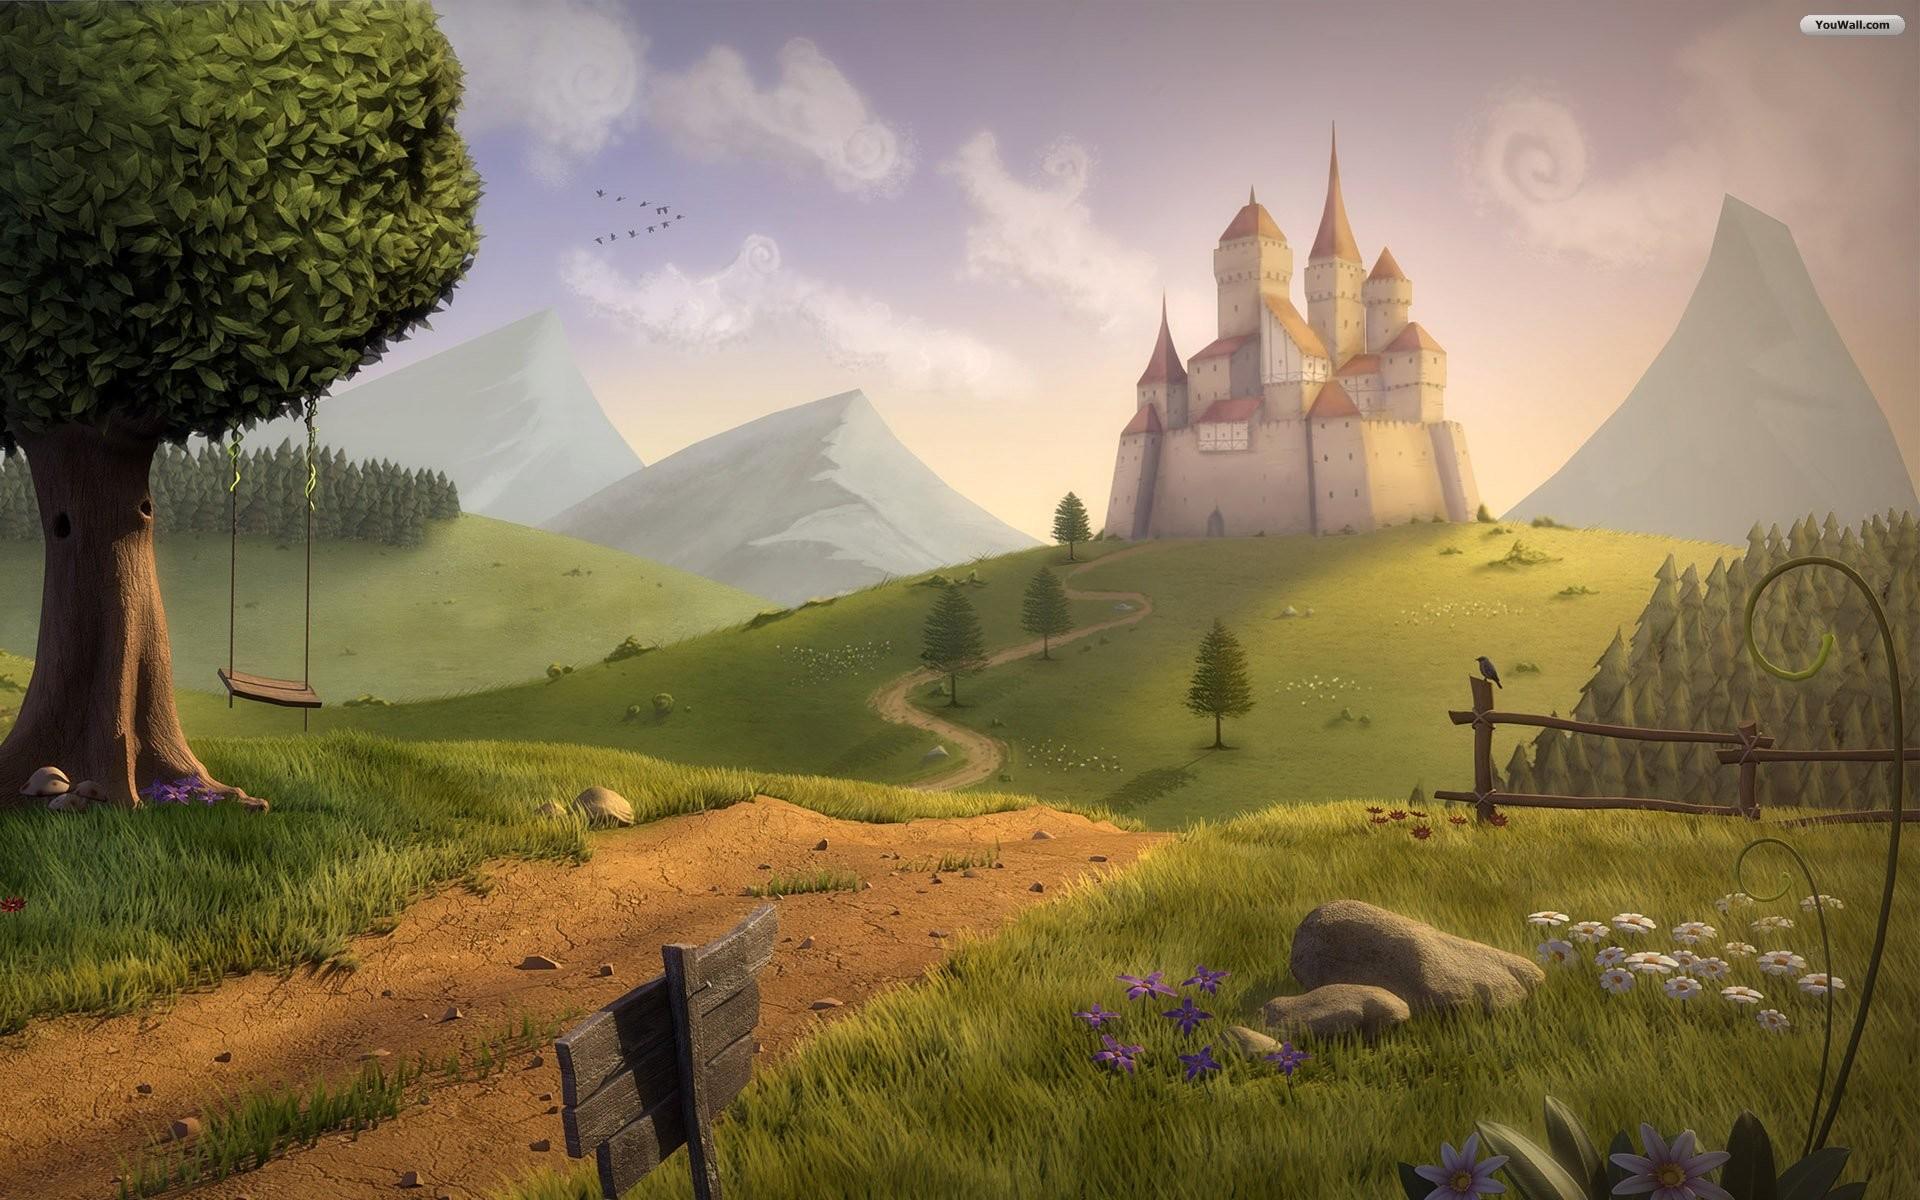 Eltz Castle HD Wallpapers, Backgrounds Wallpaper